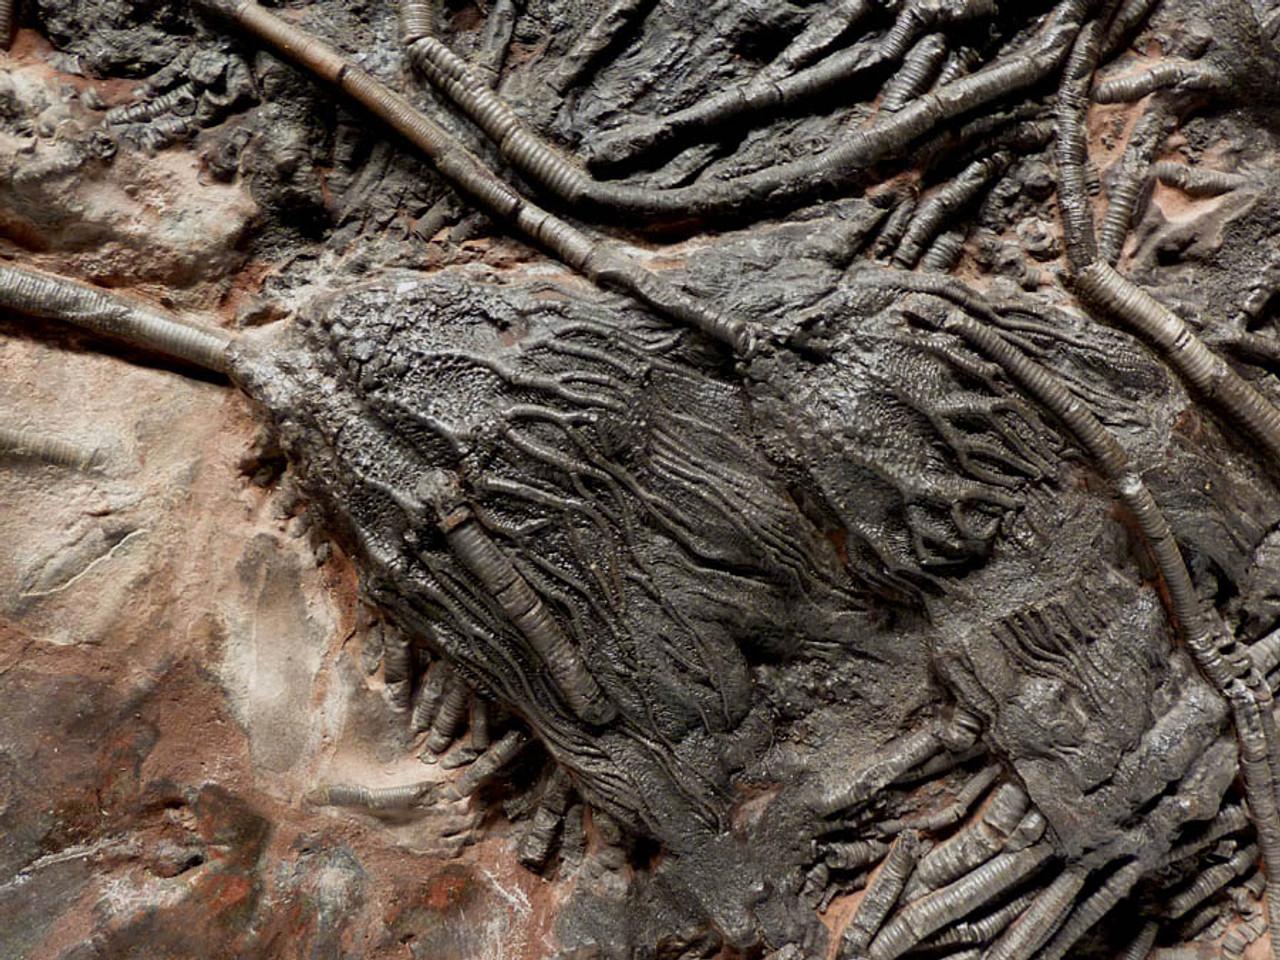 LARGE INTERIOR DESIGN CRINOID FOSSIL WITH PREHISTORIC SEA LILIES ANCIENT OCEAN FLOOR ROCK *CRI030